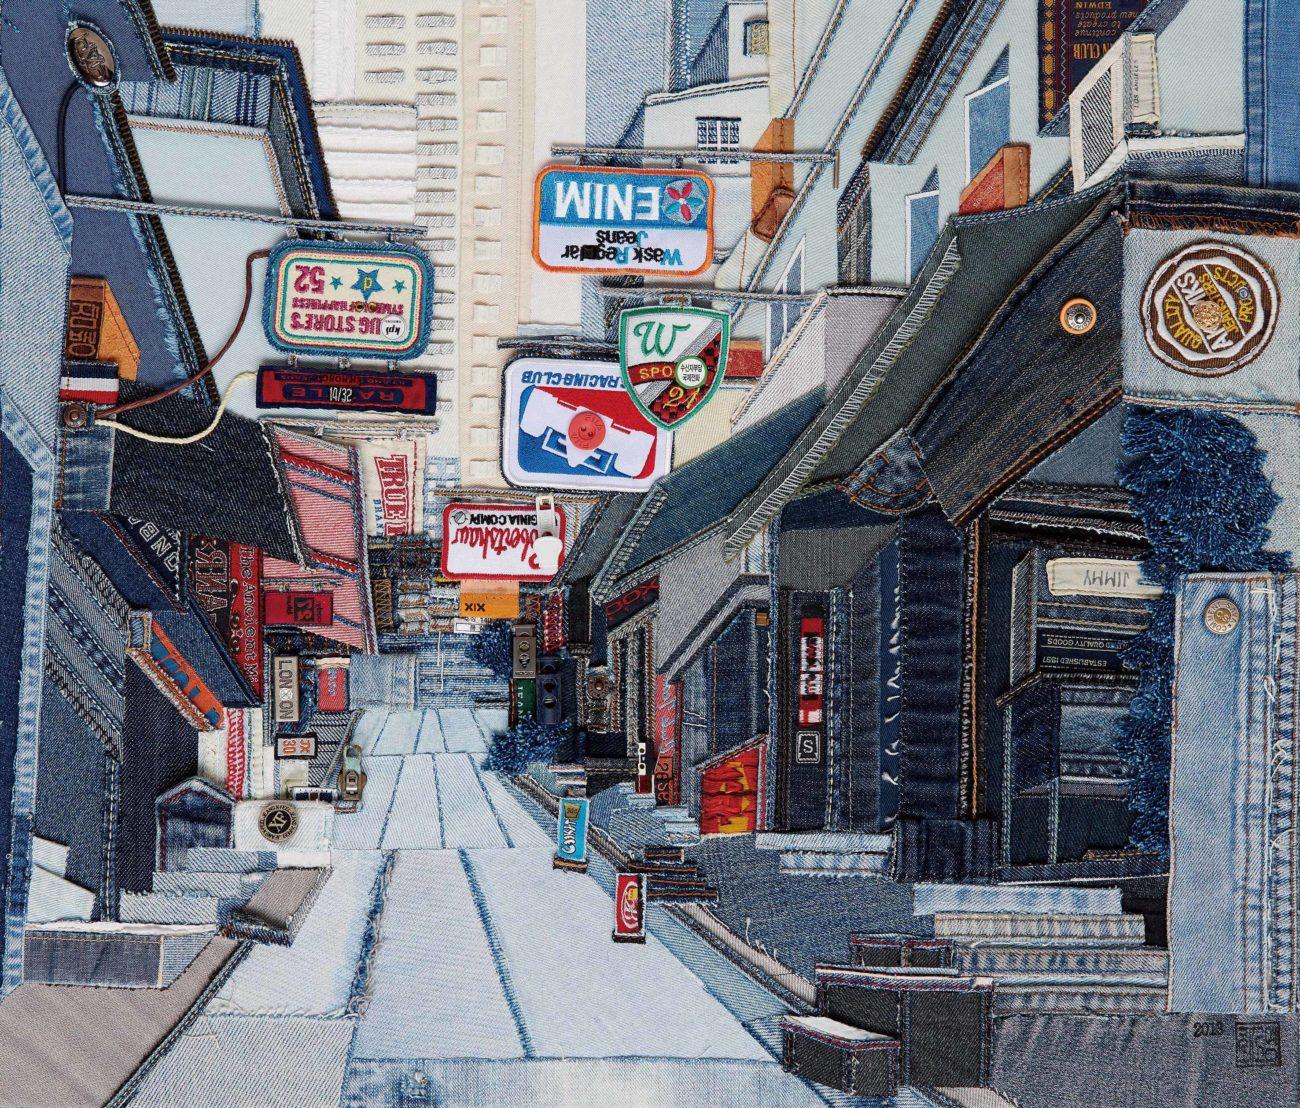 Hong Kong Soho Street, 2013 - Handwerkwereld